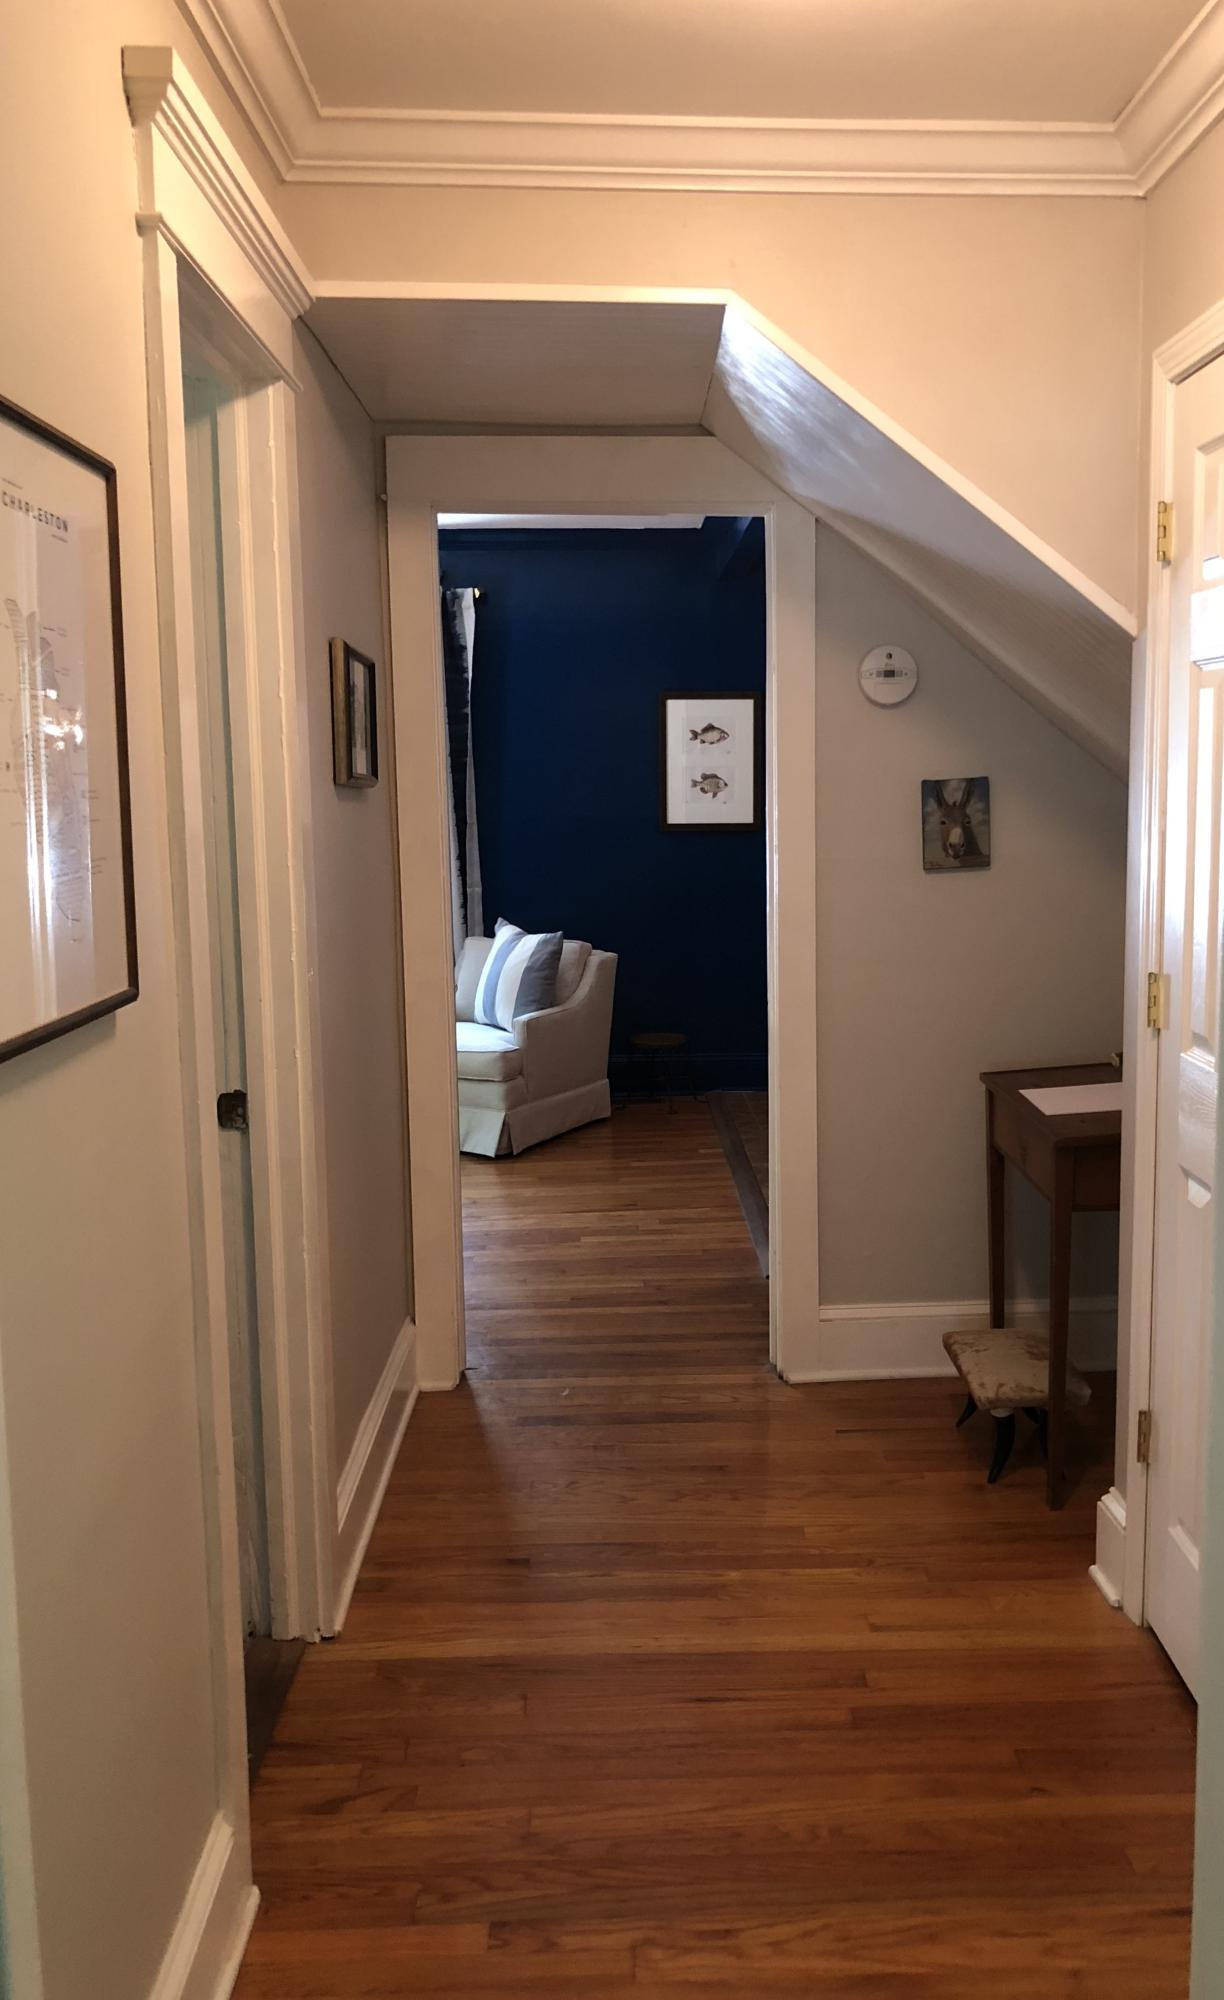 Edgewood Gardens Homes For Sale - 516 Risher, Charleston, SC - 15